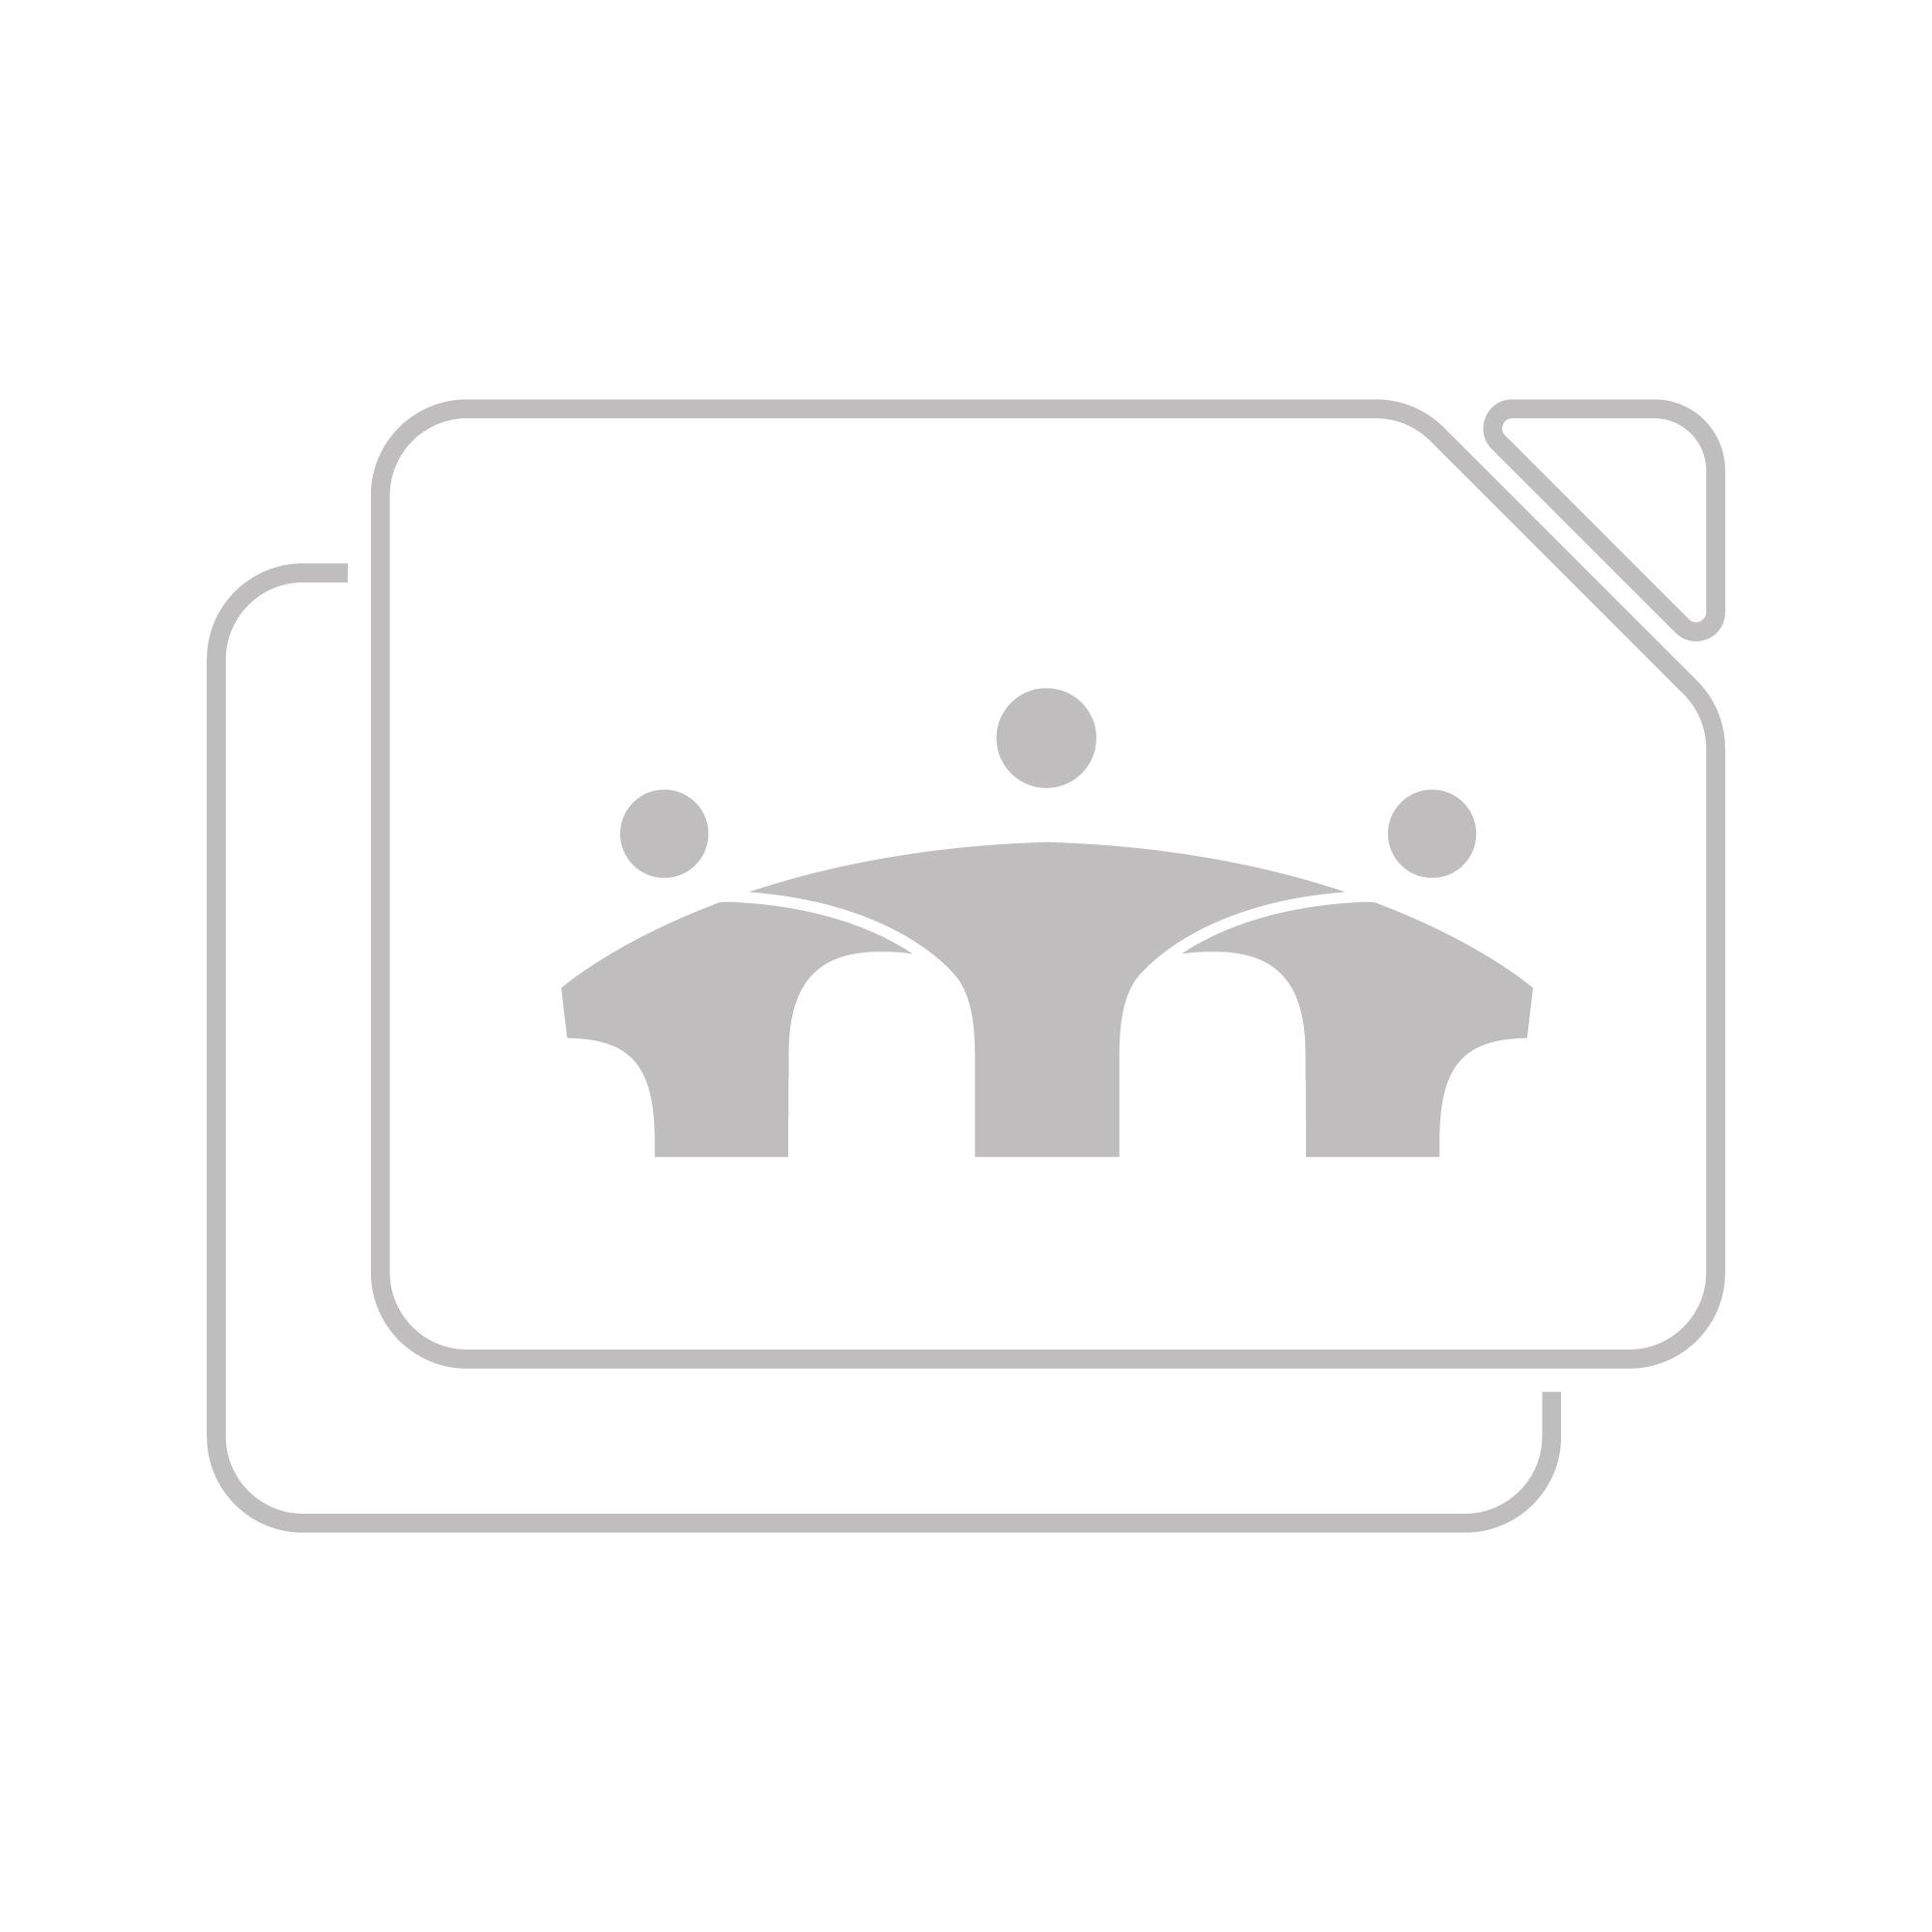 Logitech K380 for Mac Multi-Device Bluetooth Keyboard - OFFWHITE - US INT'L - INTNL